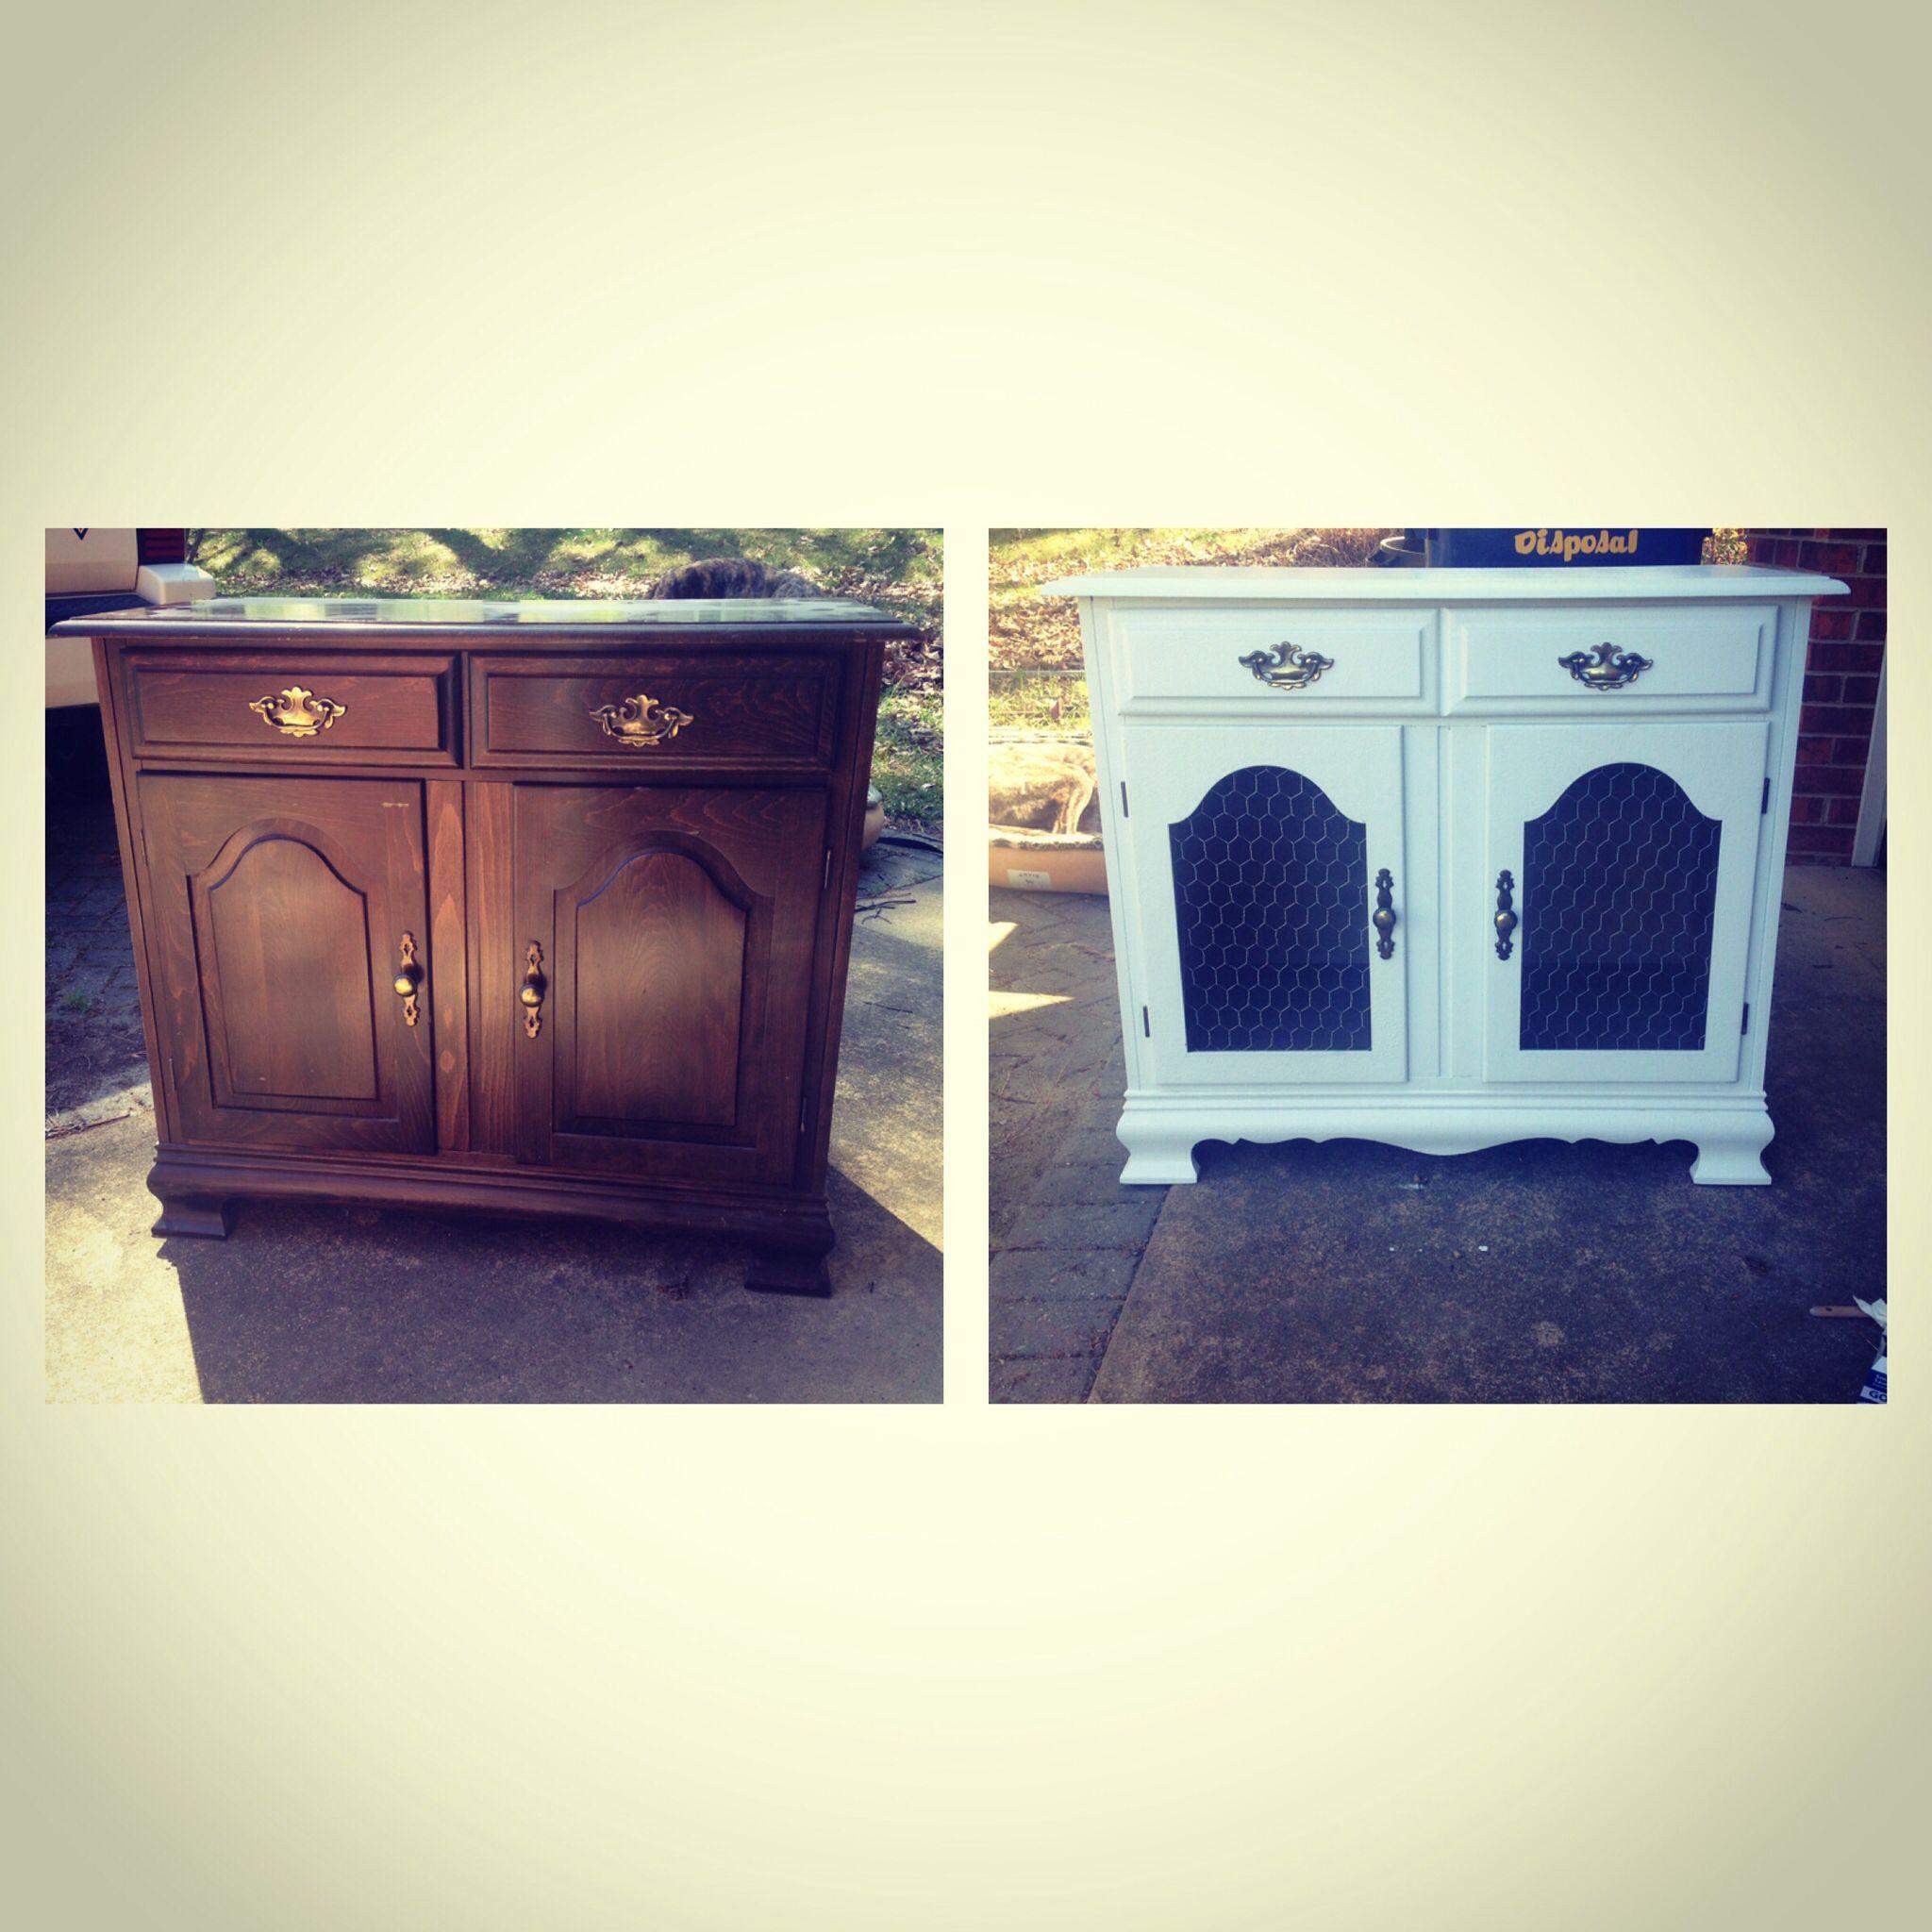 Repurposed antique cabinet for a bunny rabbit cage. Much prettier ...